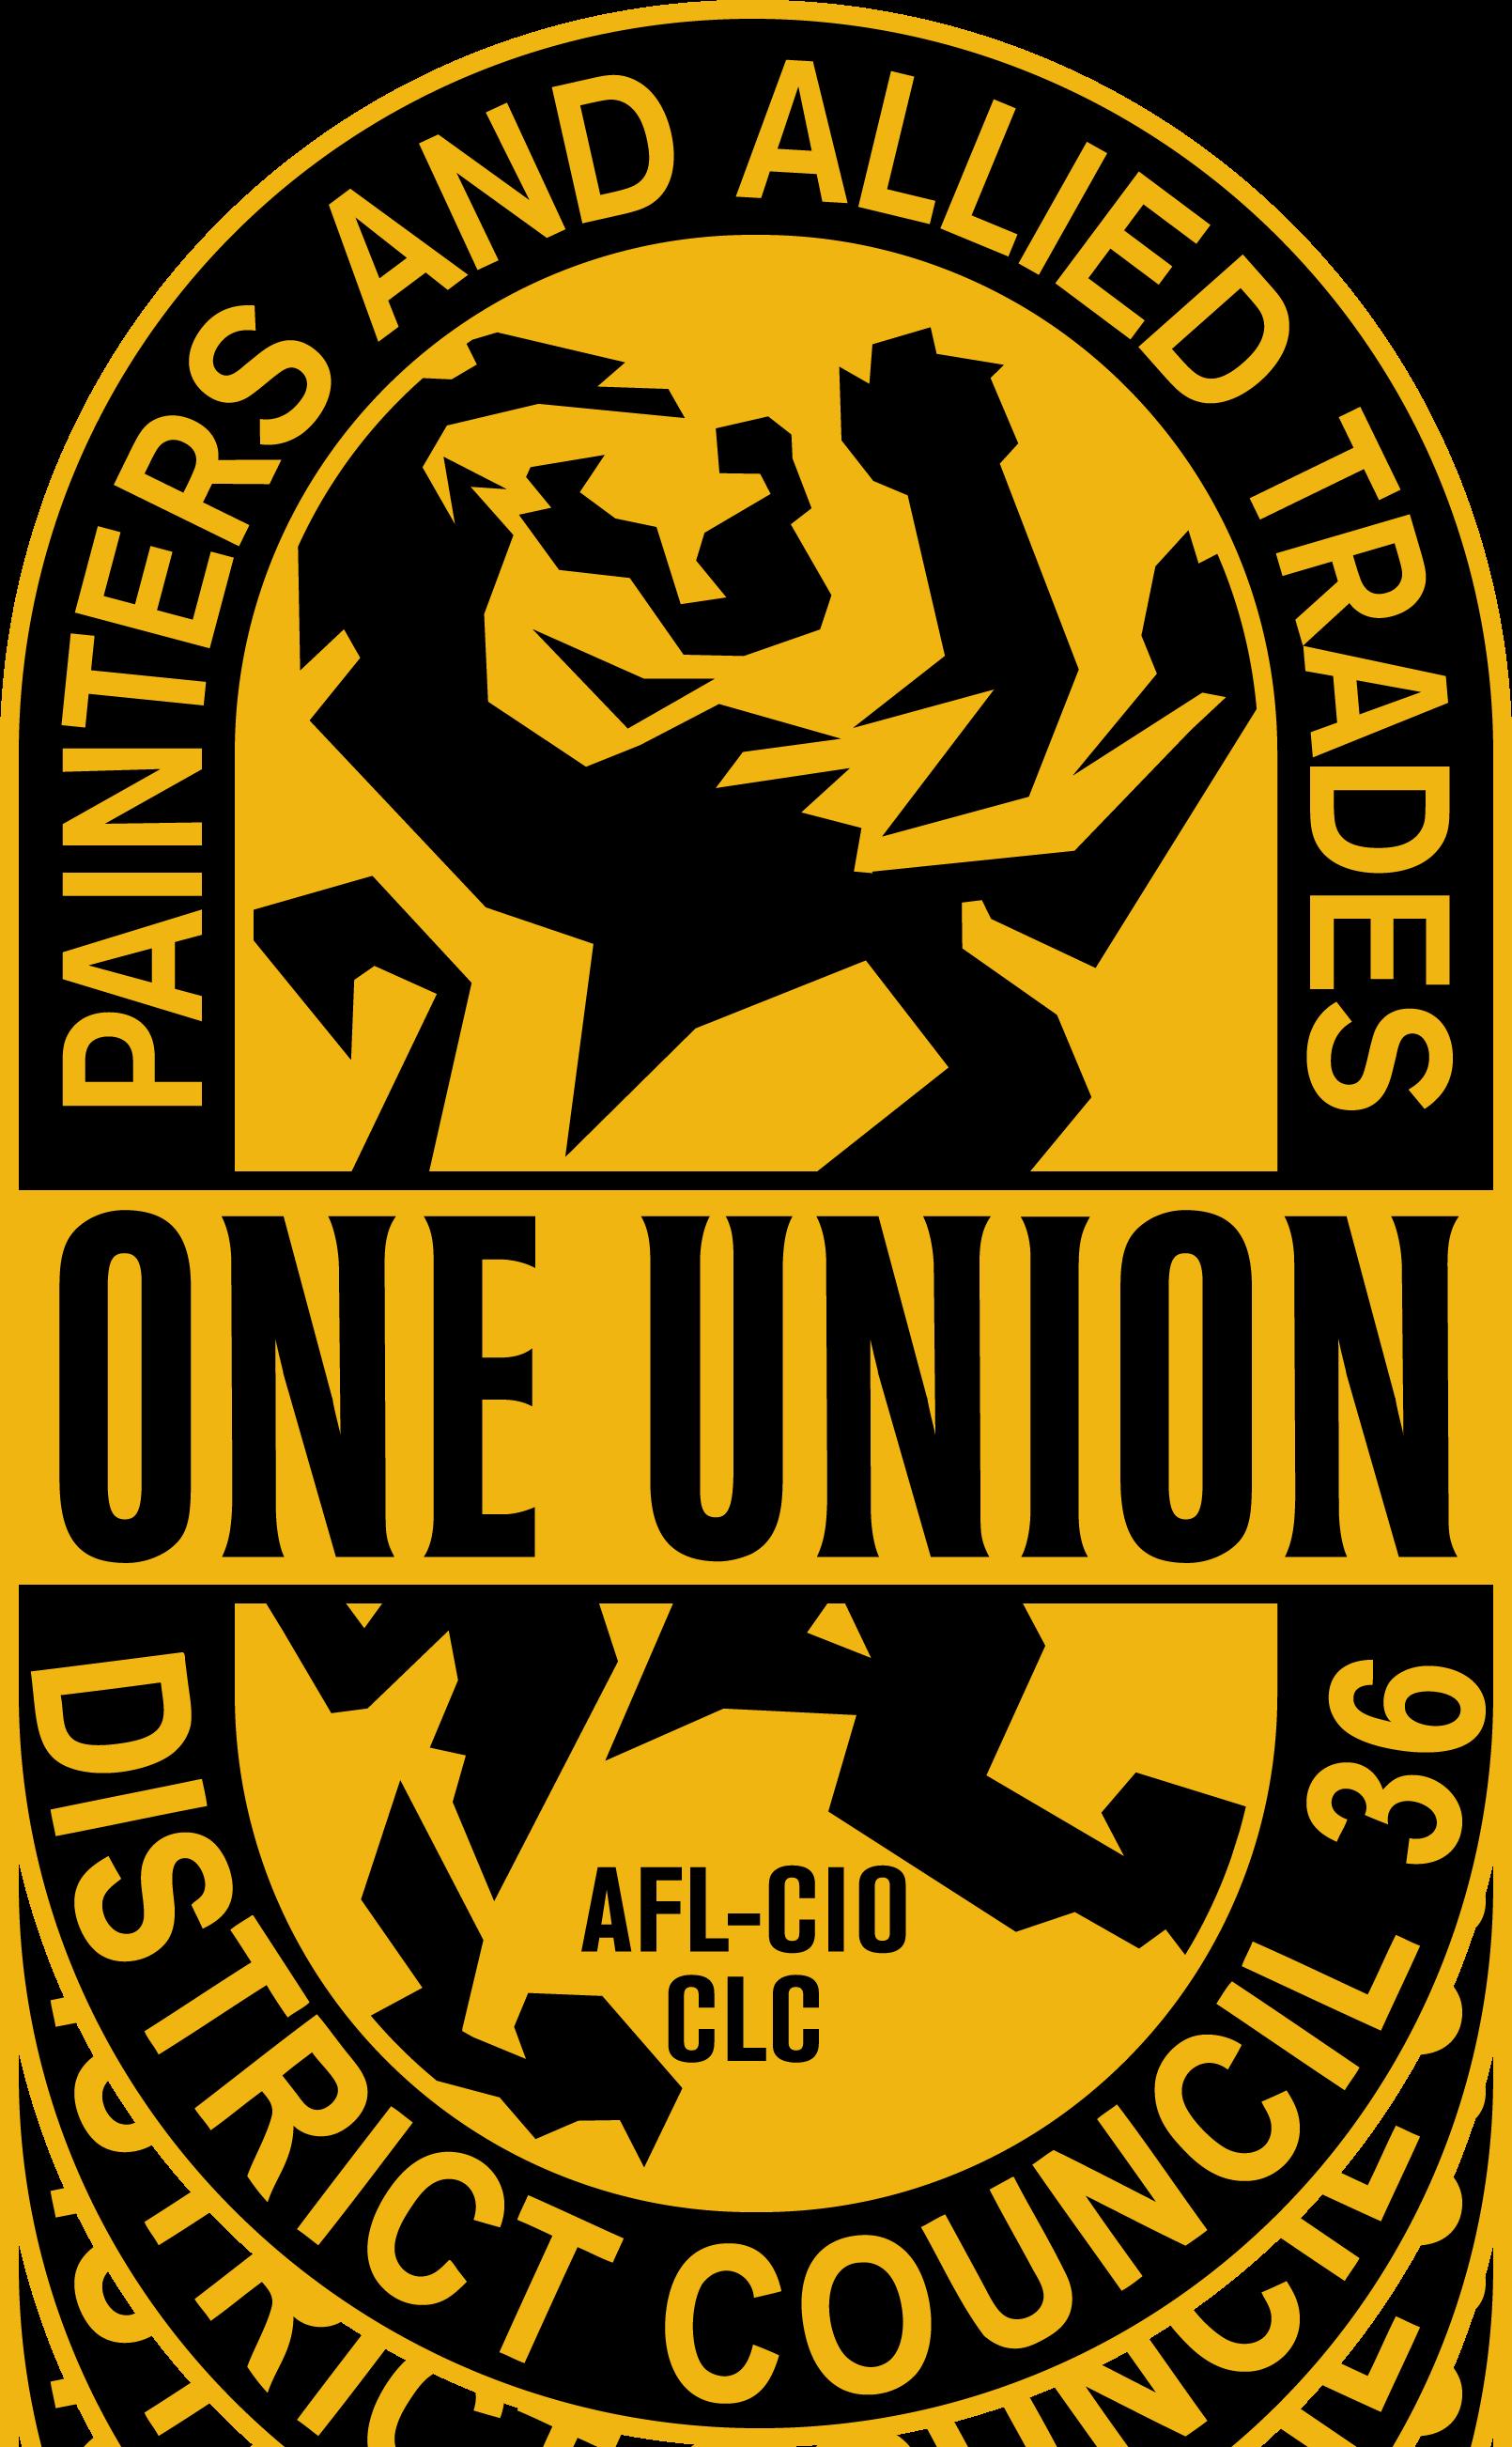 Union logo, Political logos, Union